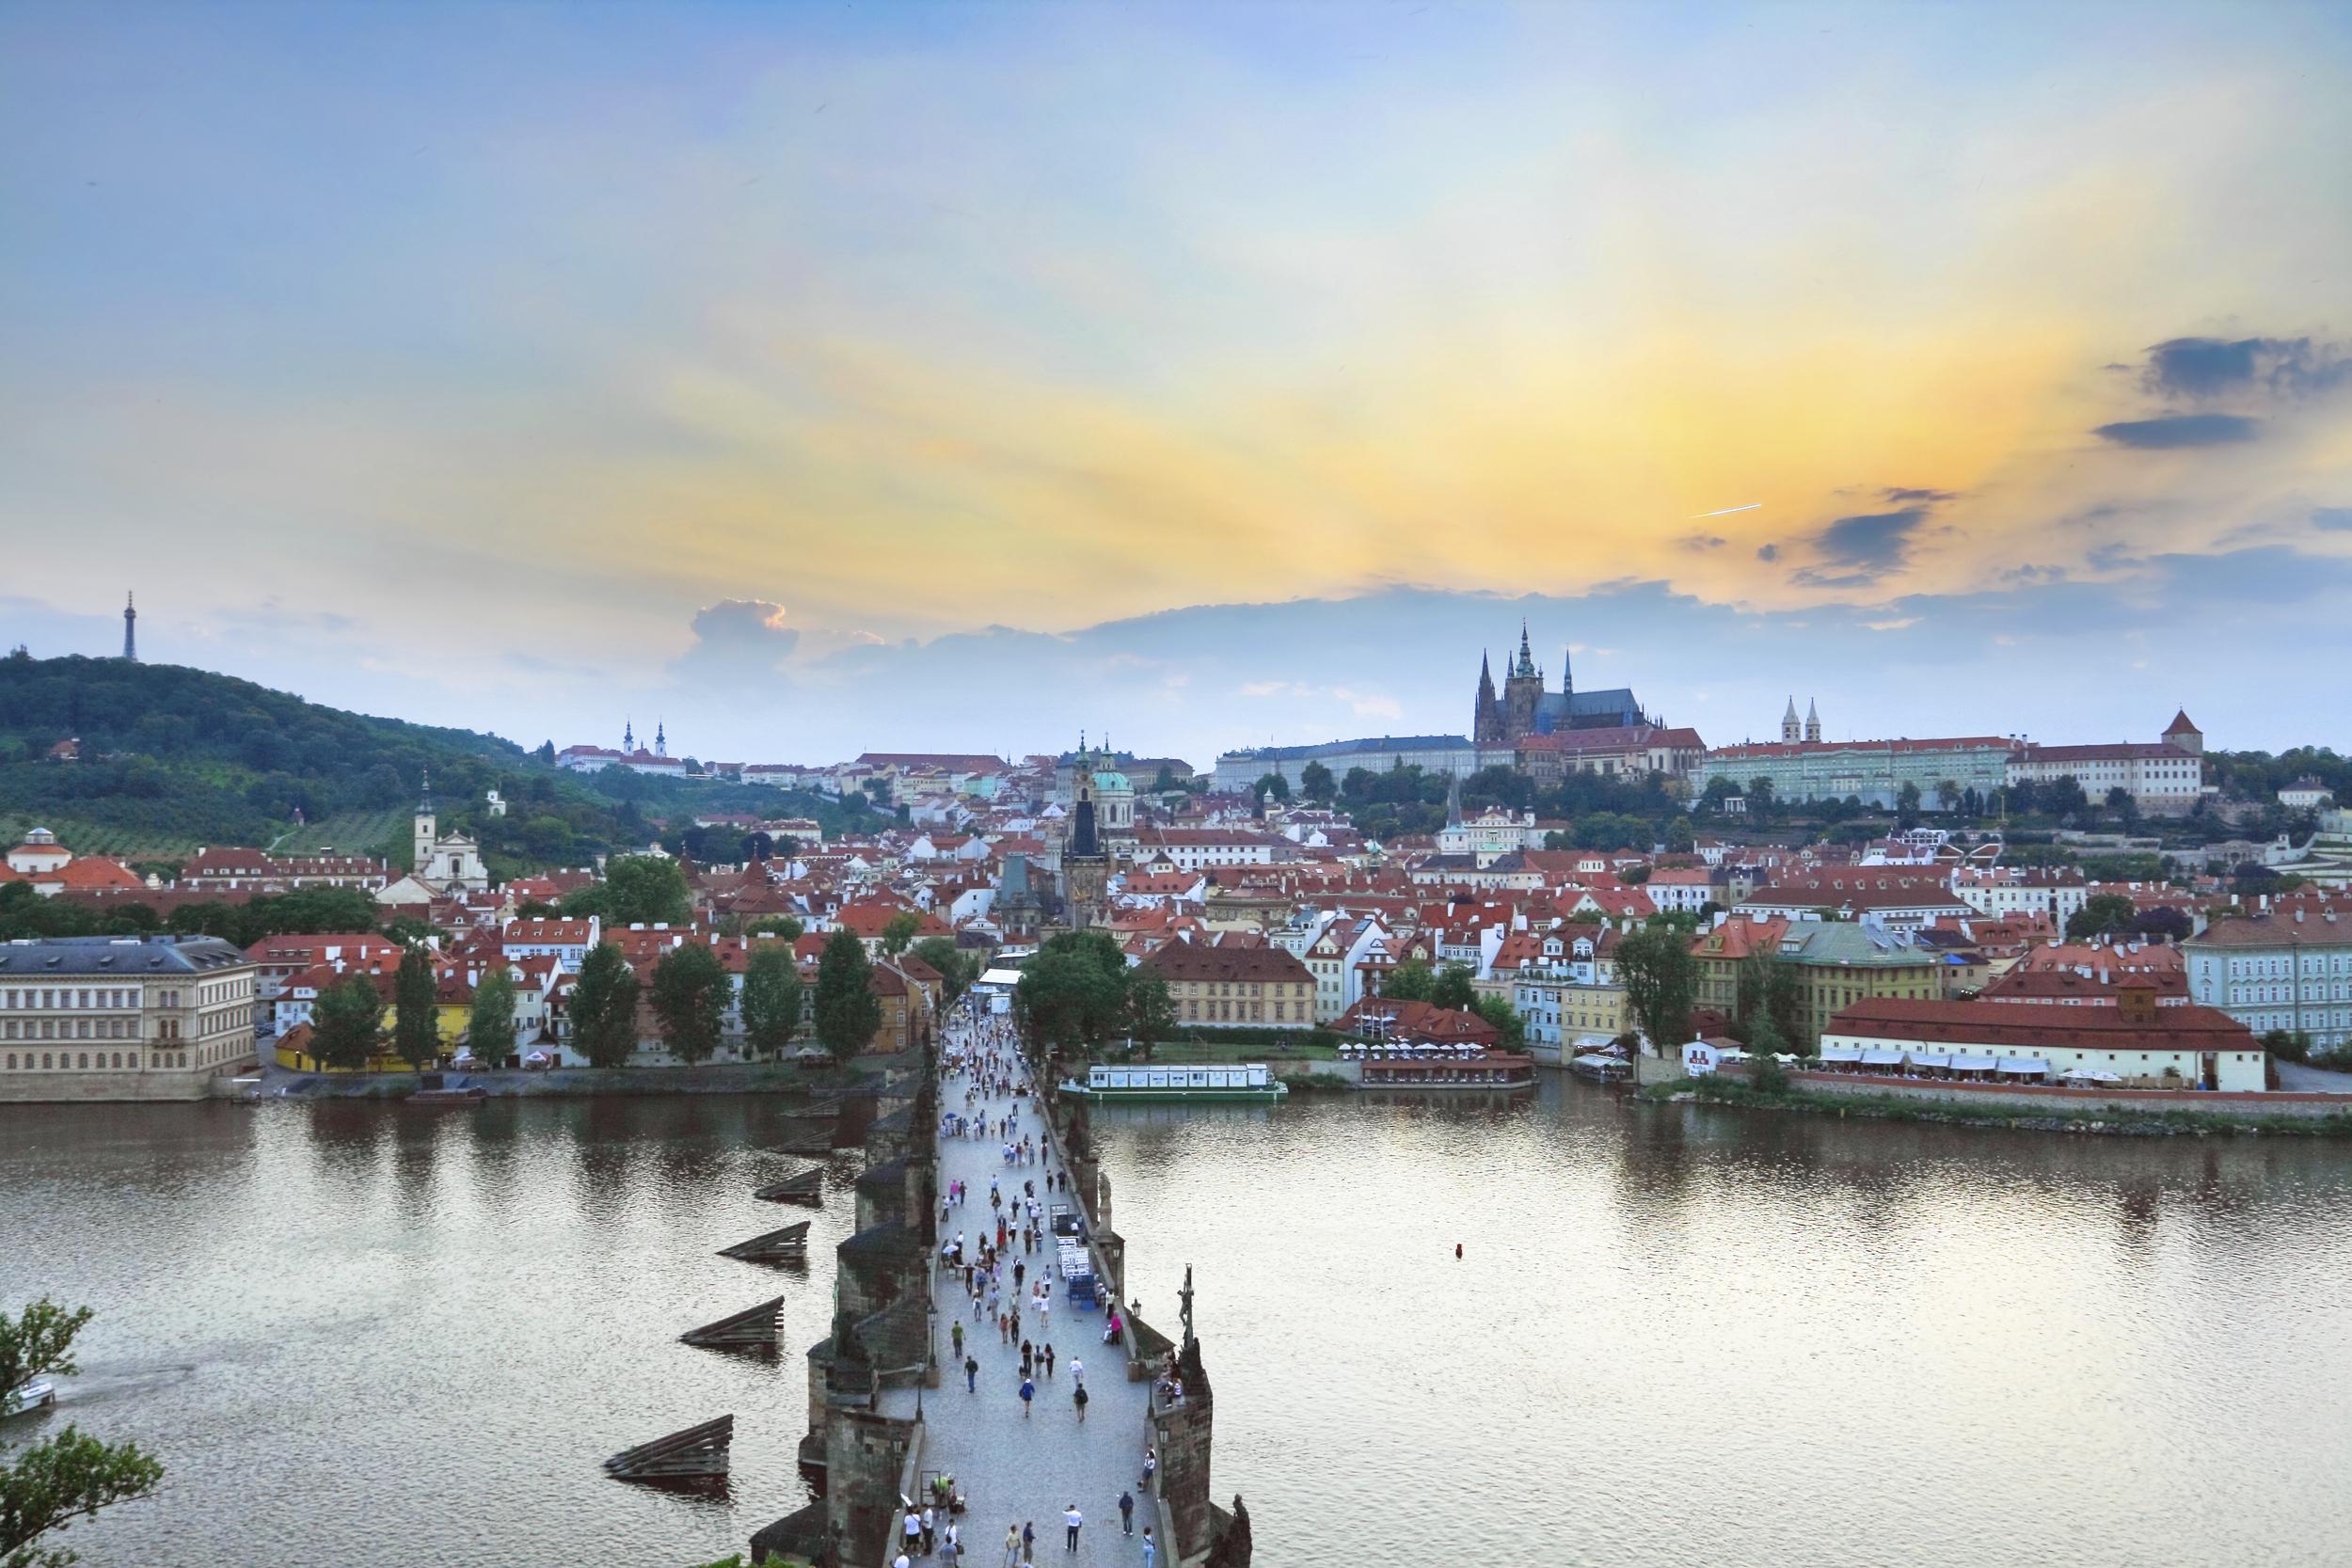 Sunset in Prague_ThinkStock_19jul12.jpg